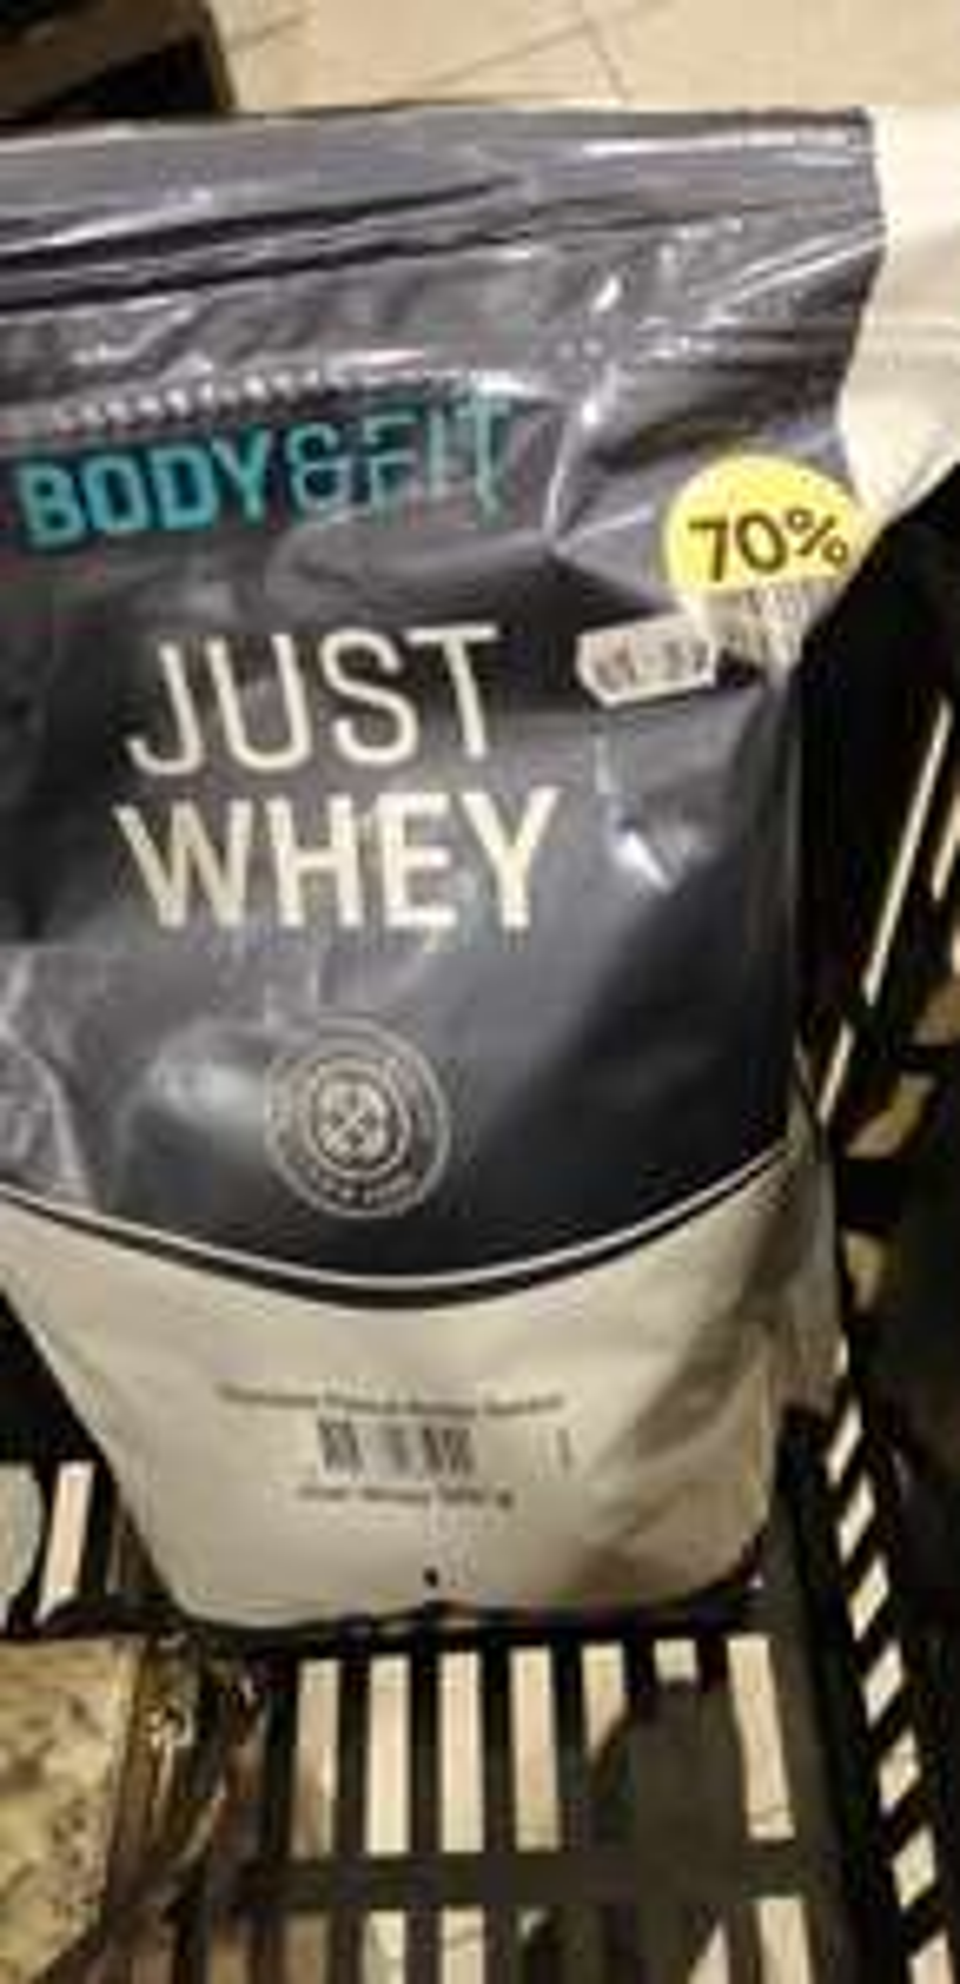 Whey / Proteïne poeder body & fit - Etos - met 70% korting!